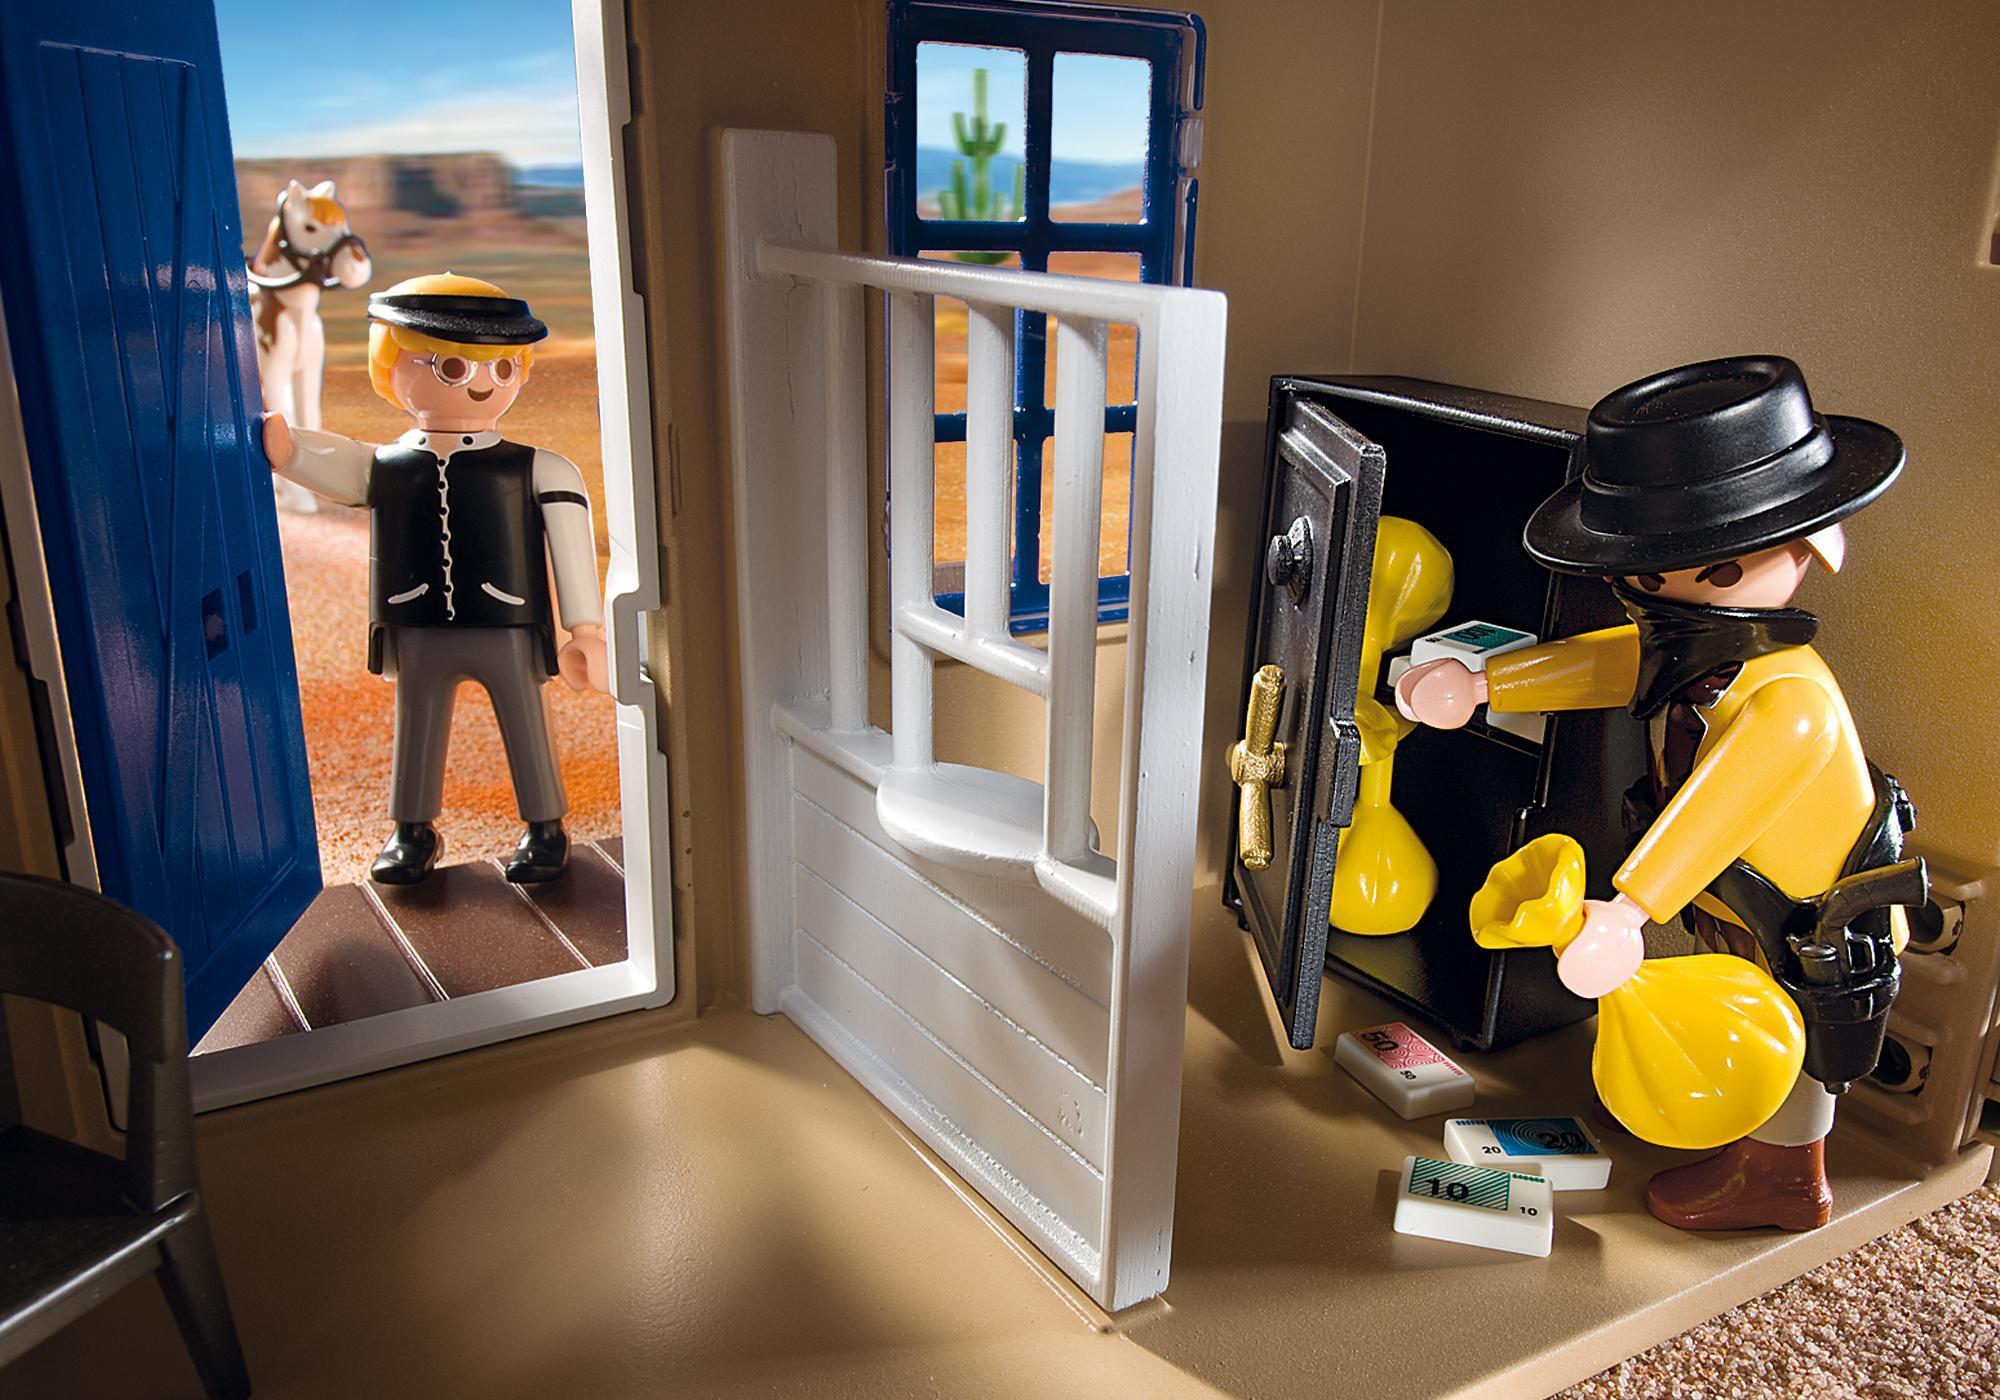 http://media.playmobil.com/i/playmobil/4398_product_extra2/Mitnehm-WesternCity